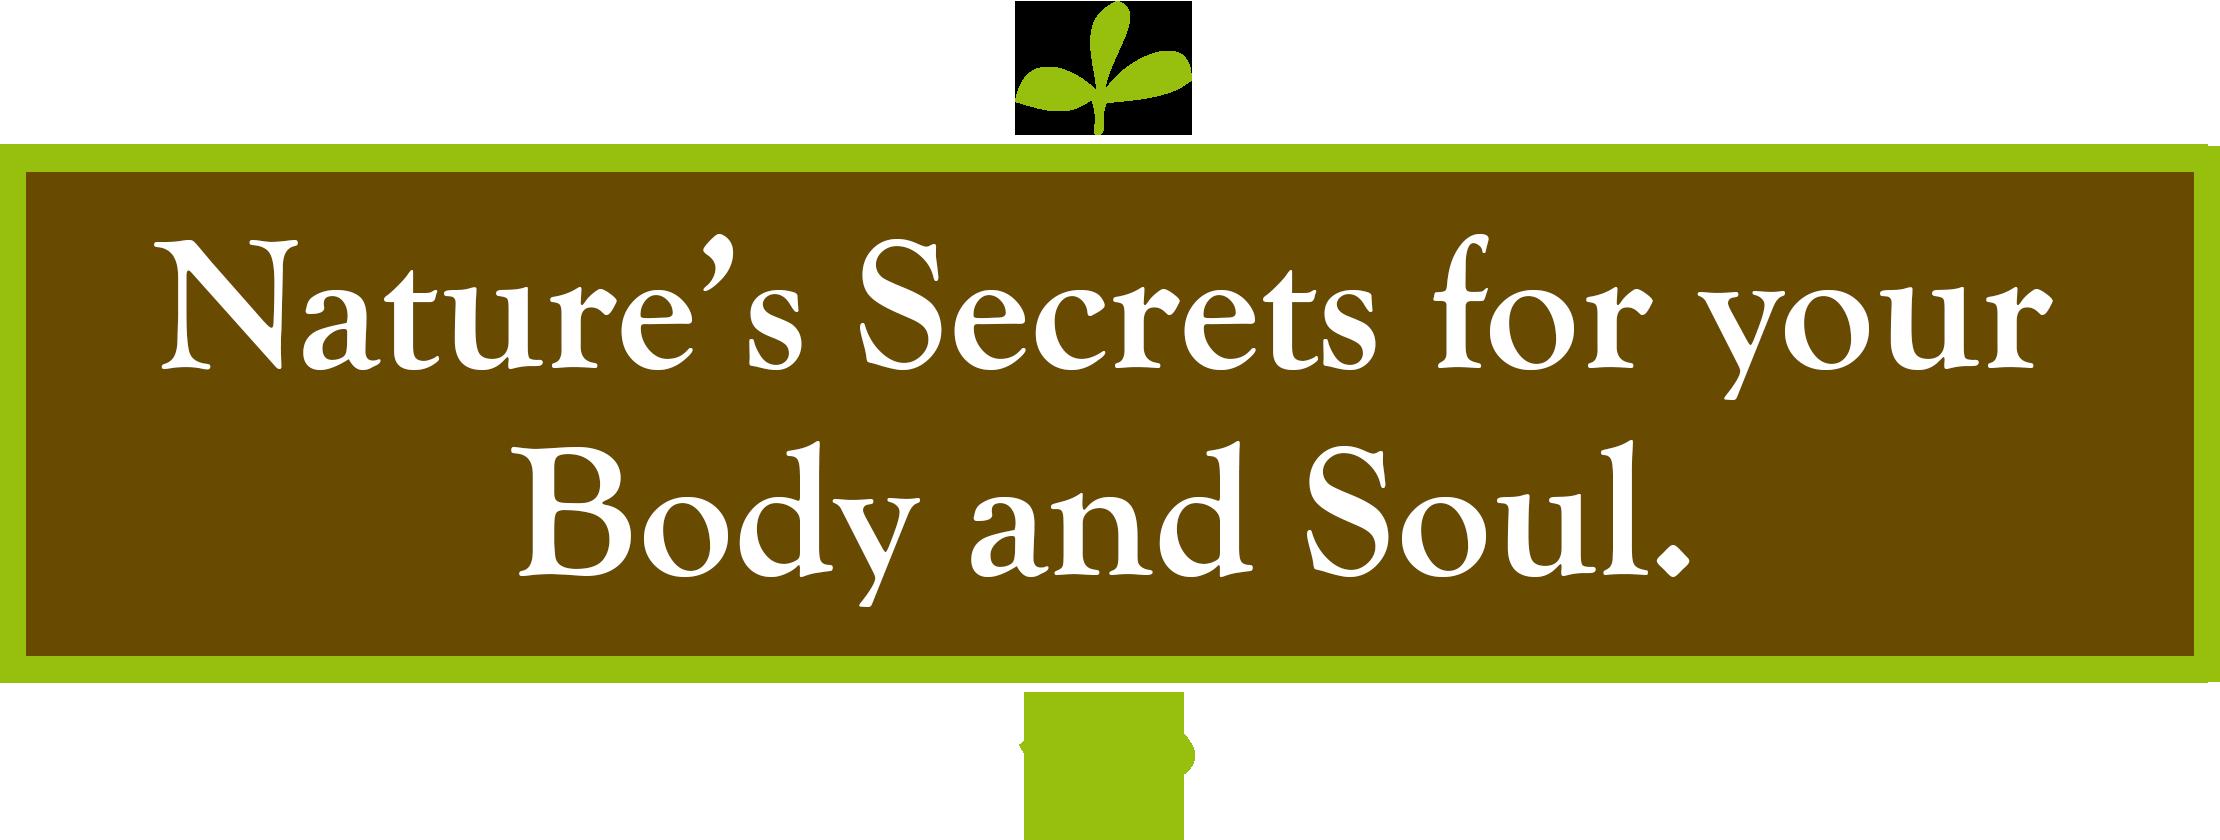 Mia Secrets Title Image